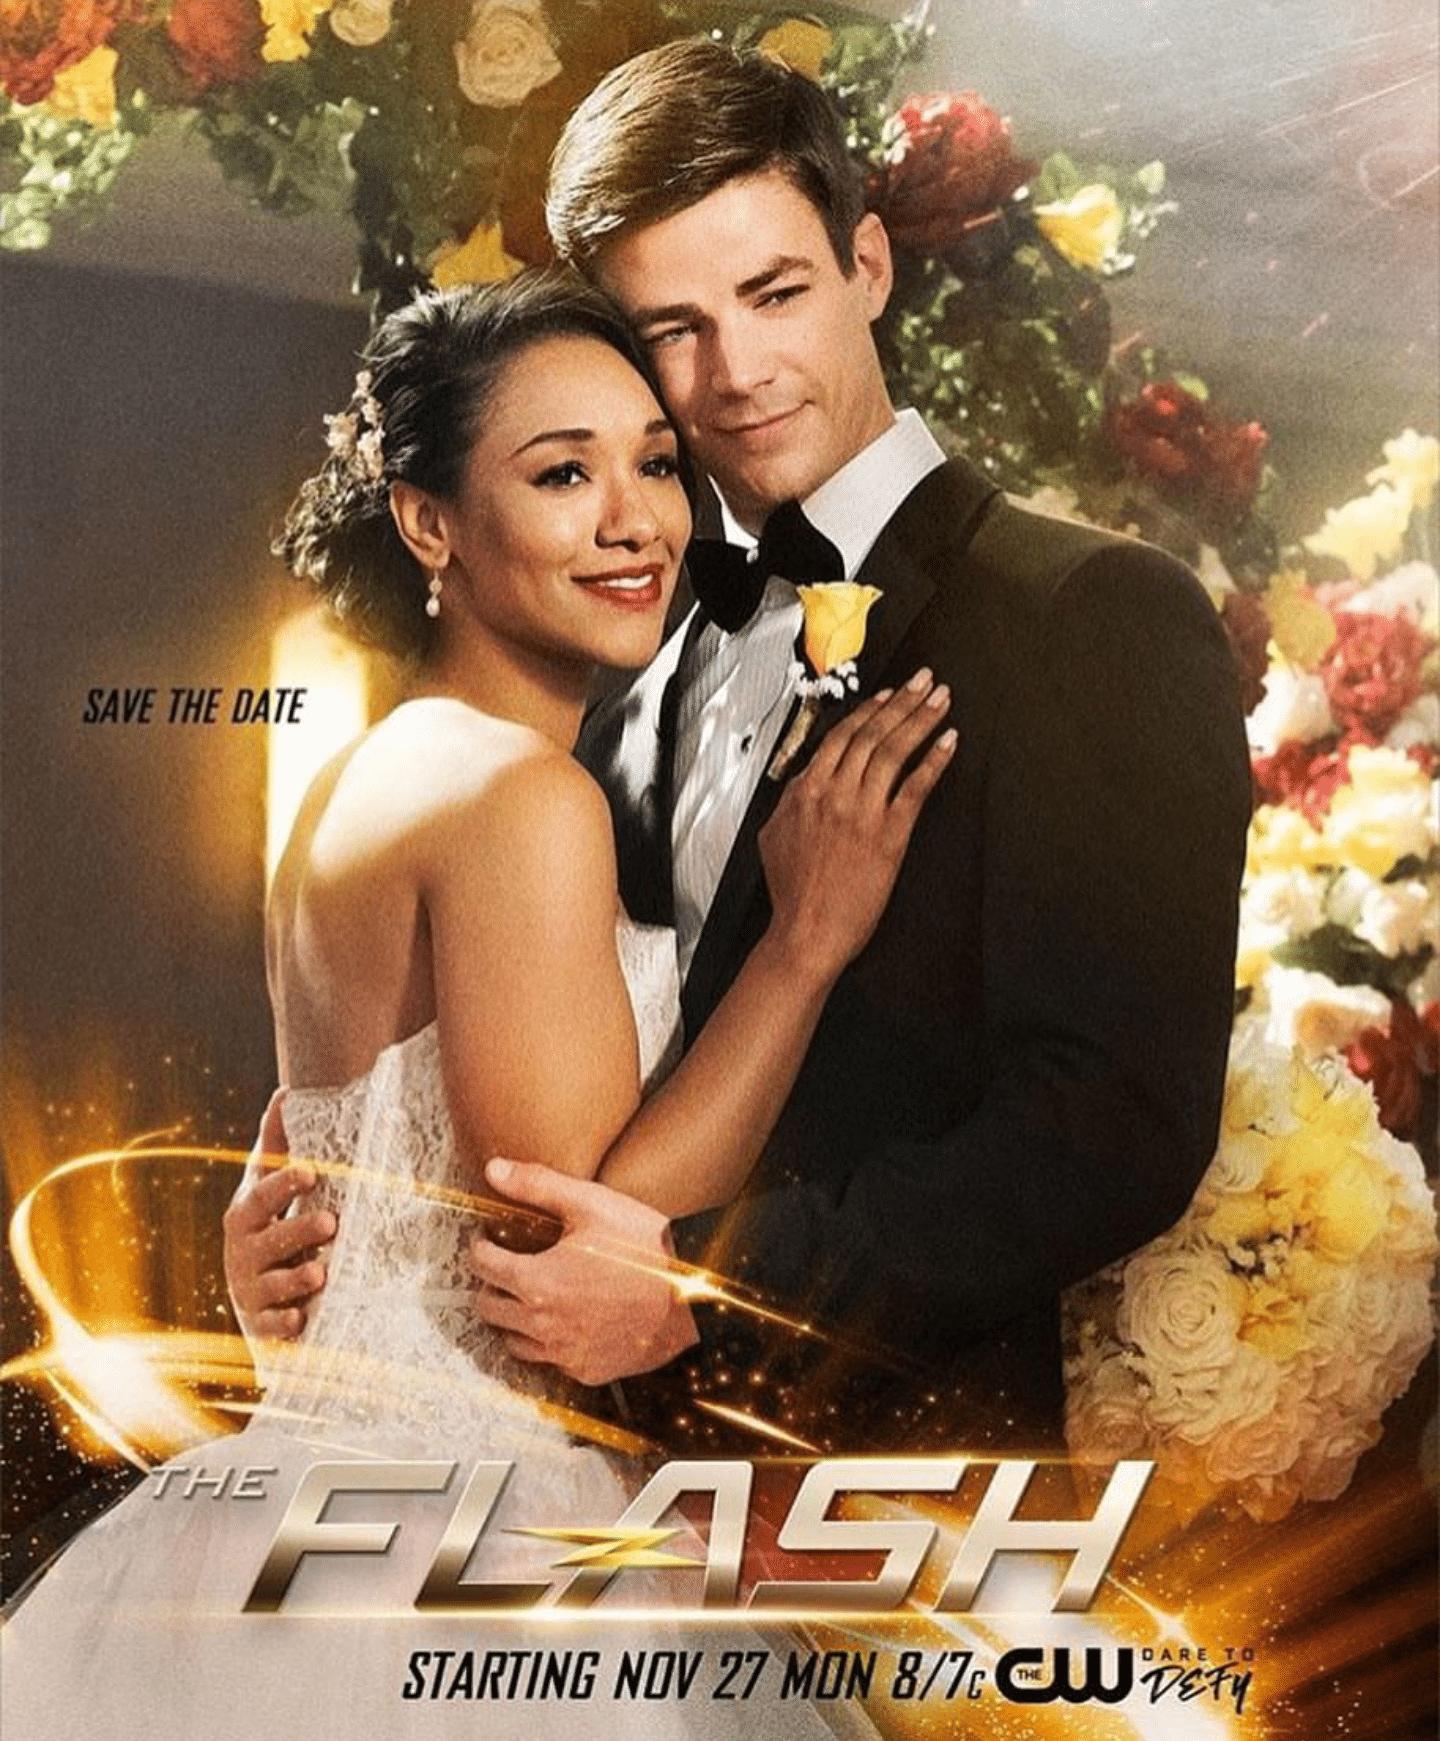 Barry Allen and Iris poster